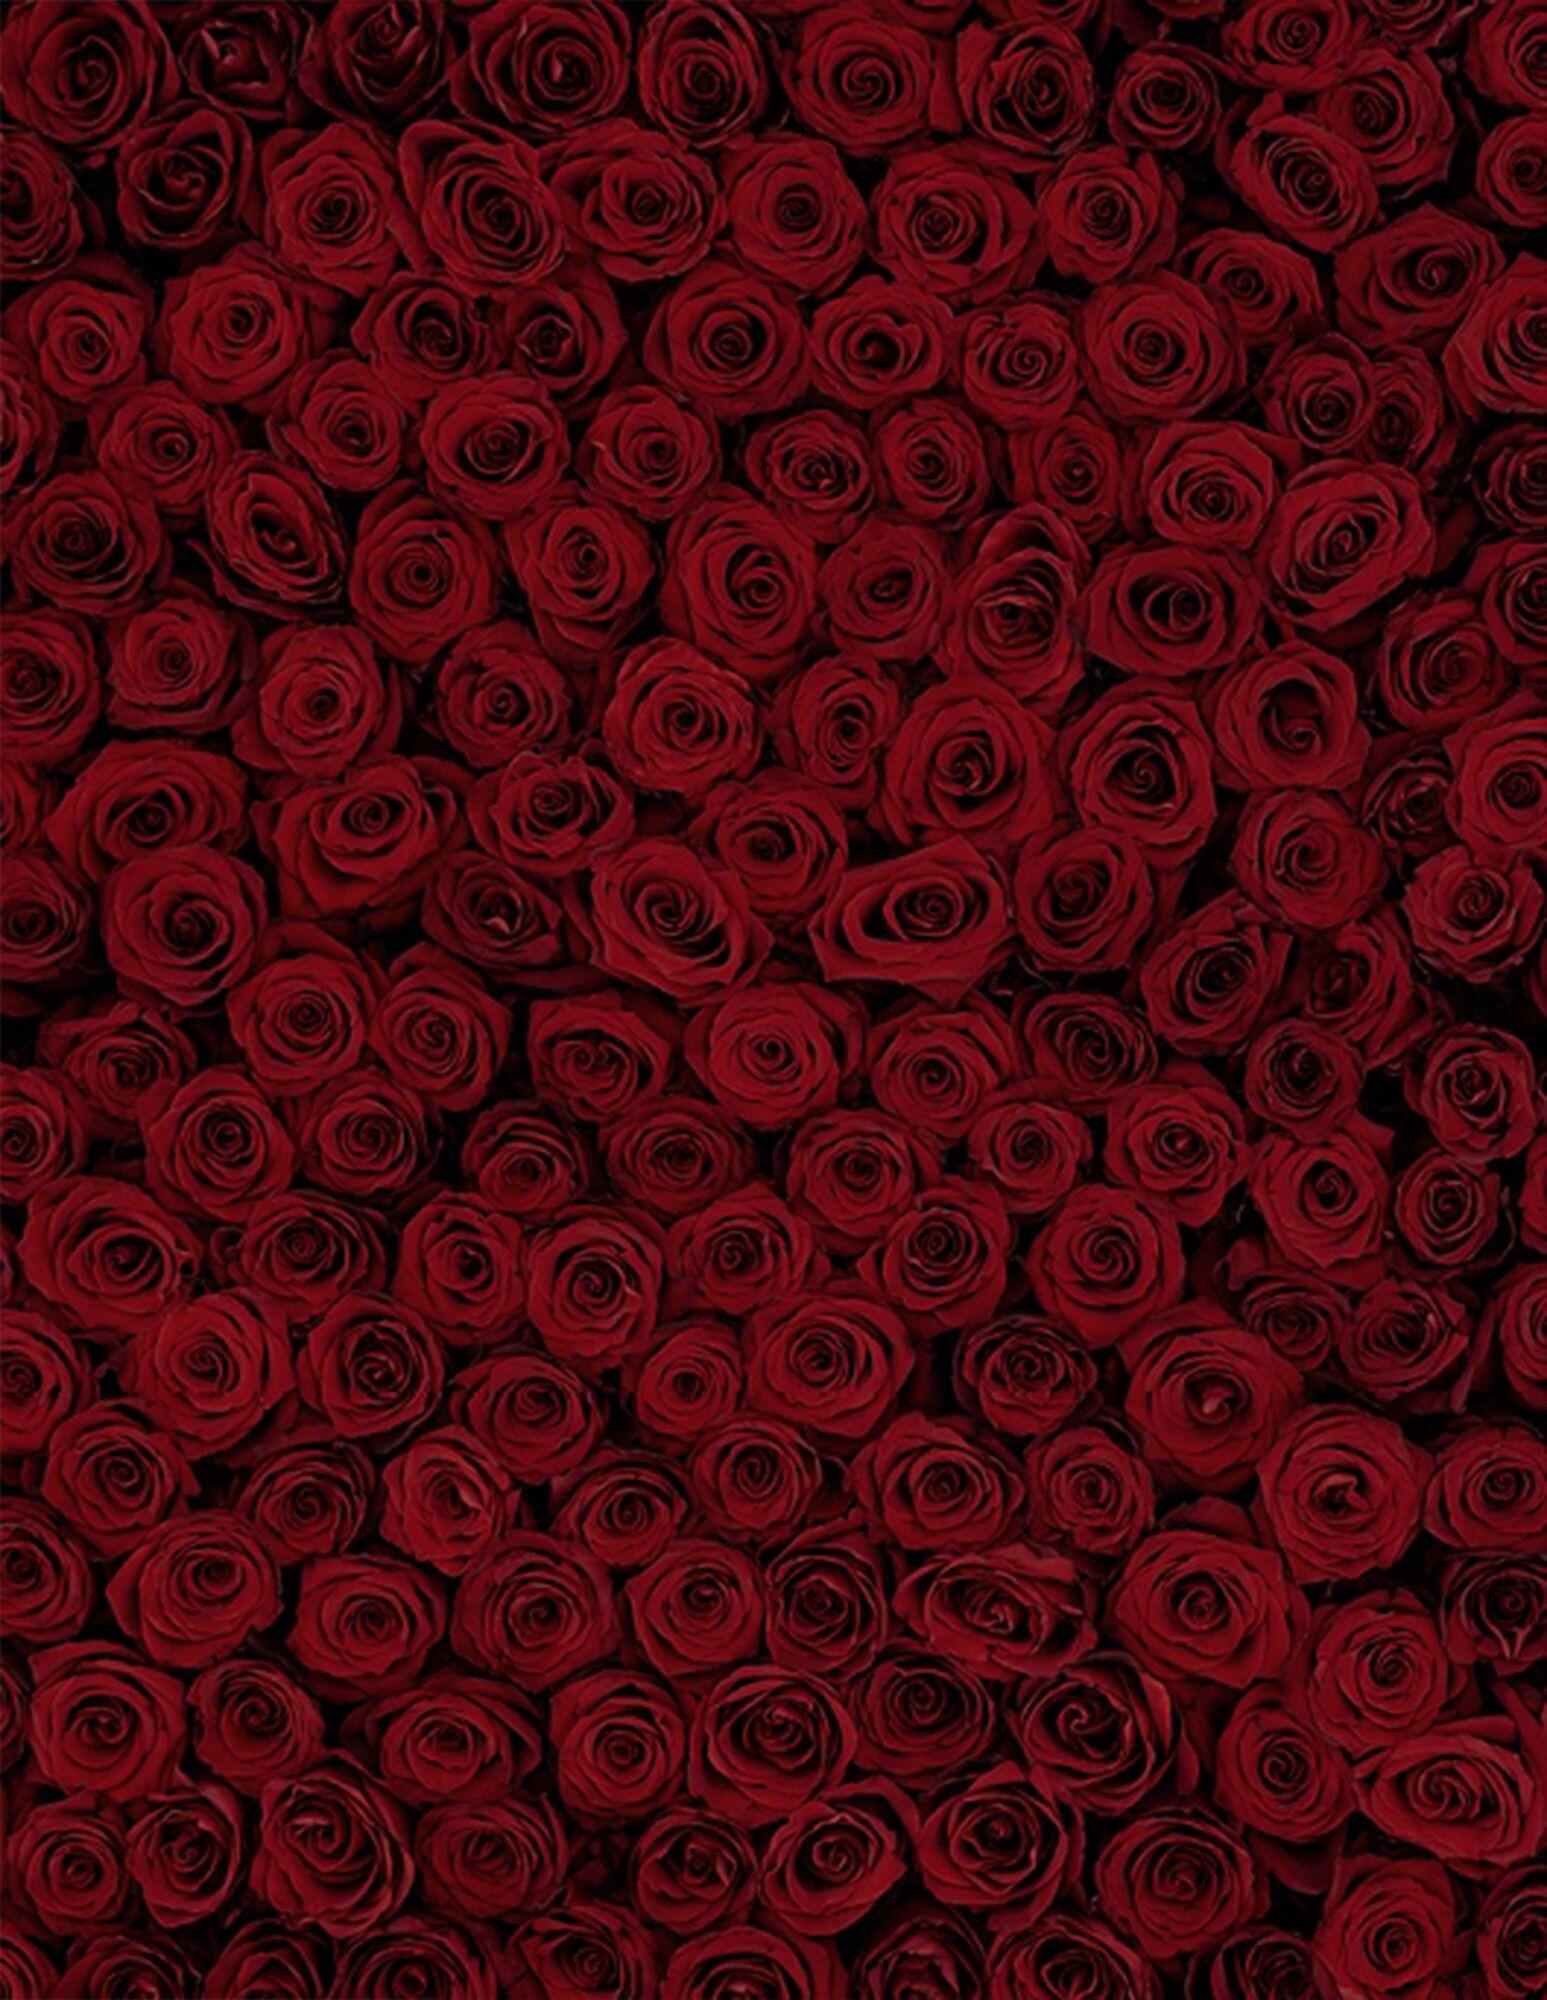 rd-event-valentine-s-day